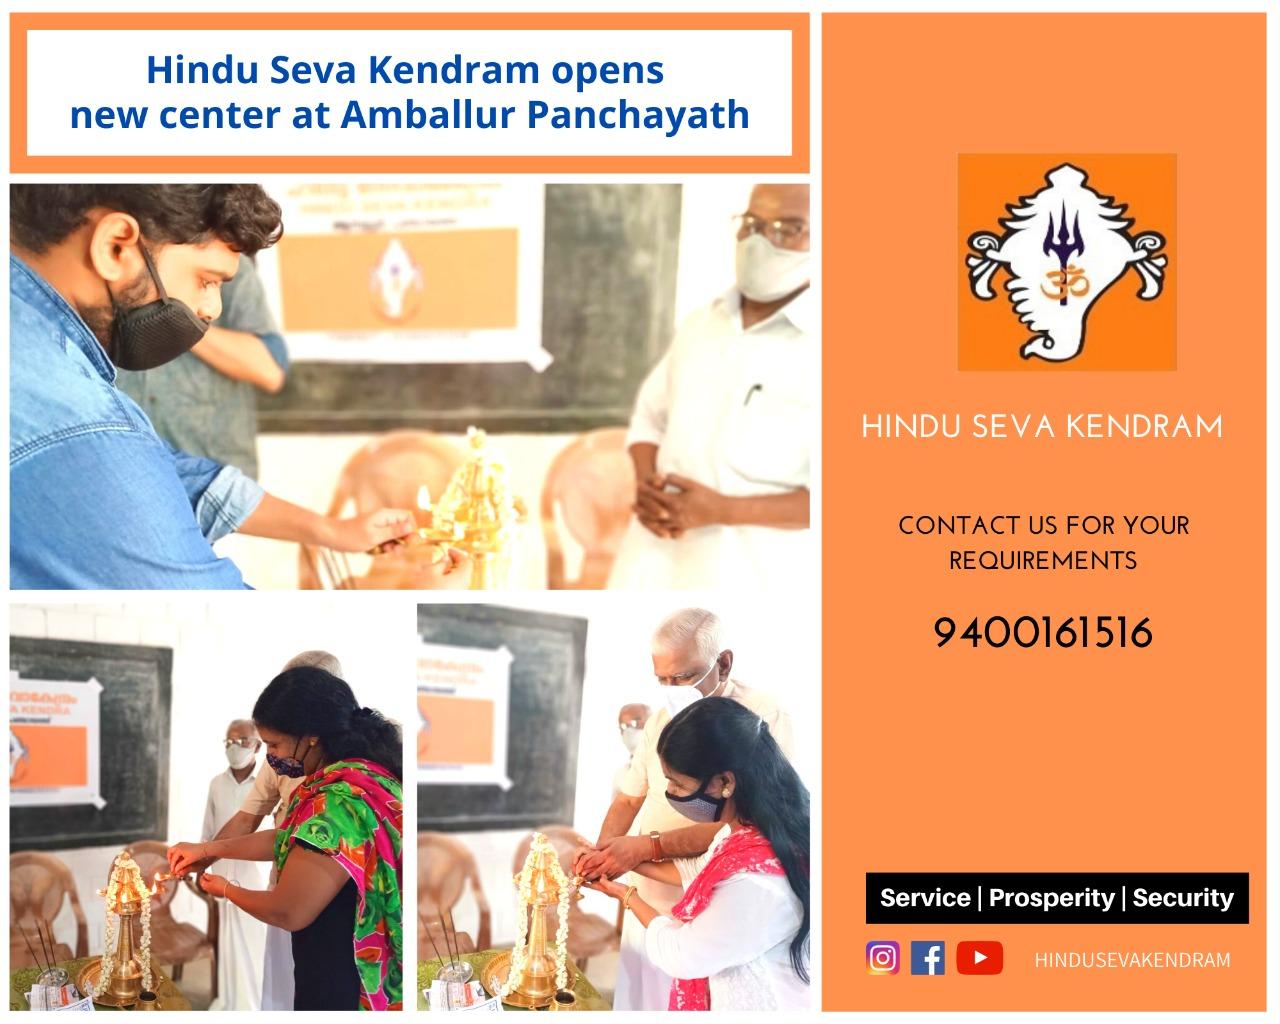 Hindu Seva Kendram opens new center at Amballur Panchayath